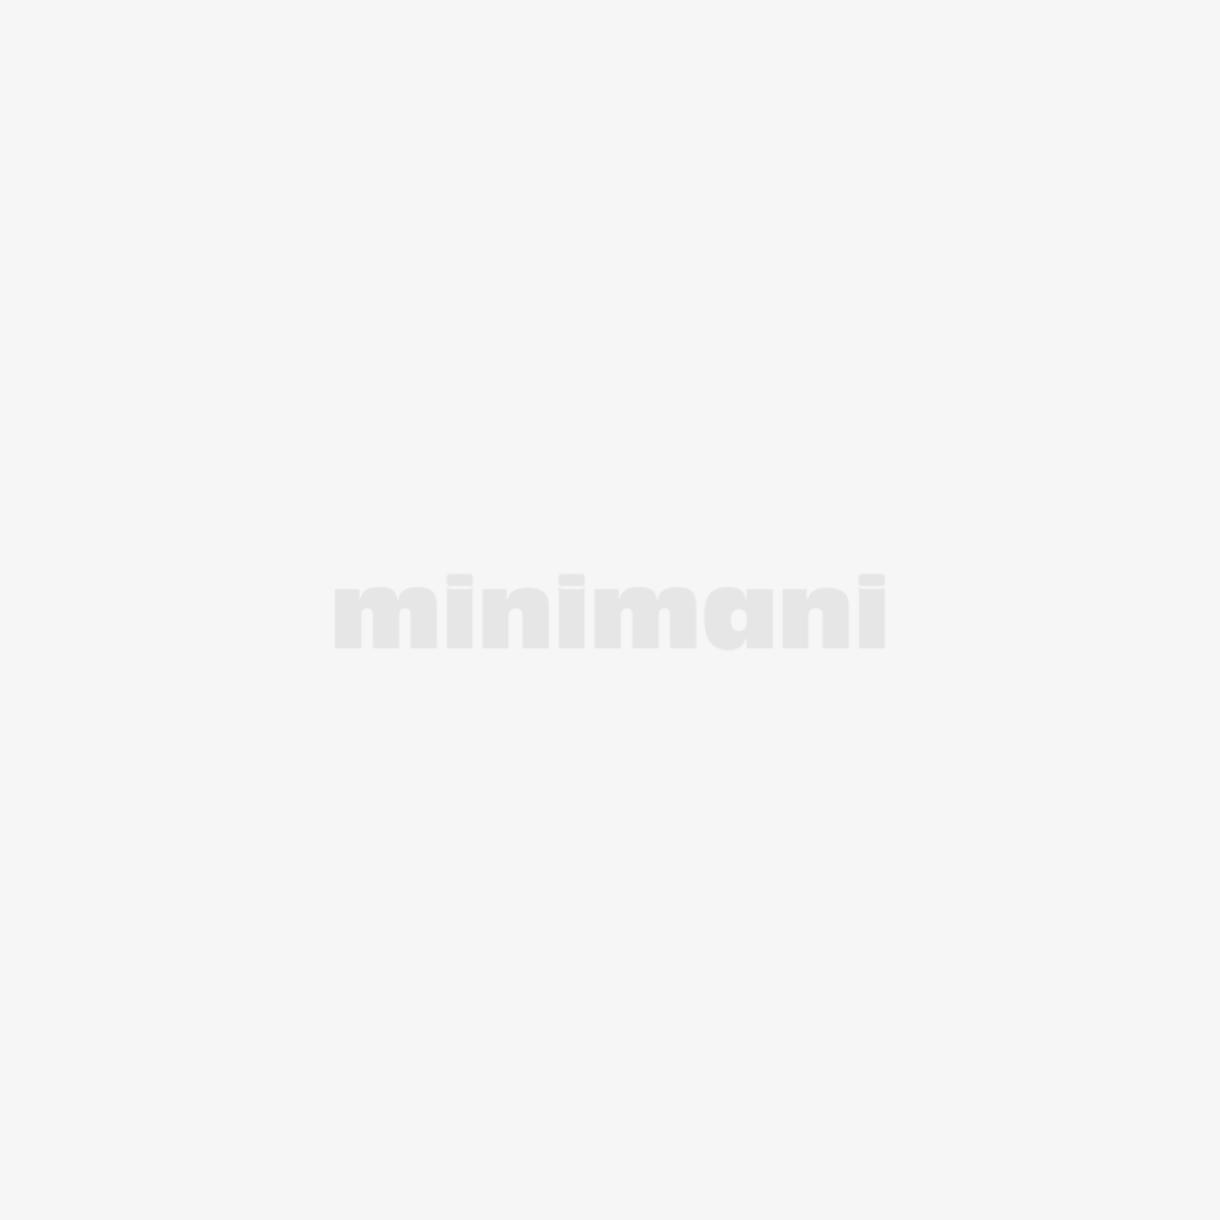 M-FILTER RAITISILMASUODATIN MAC 8017 C-MAX, MONDEO IV